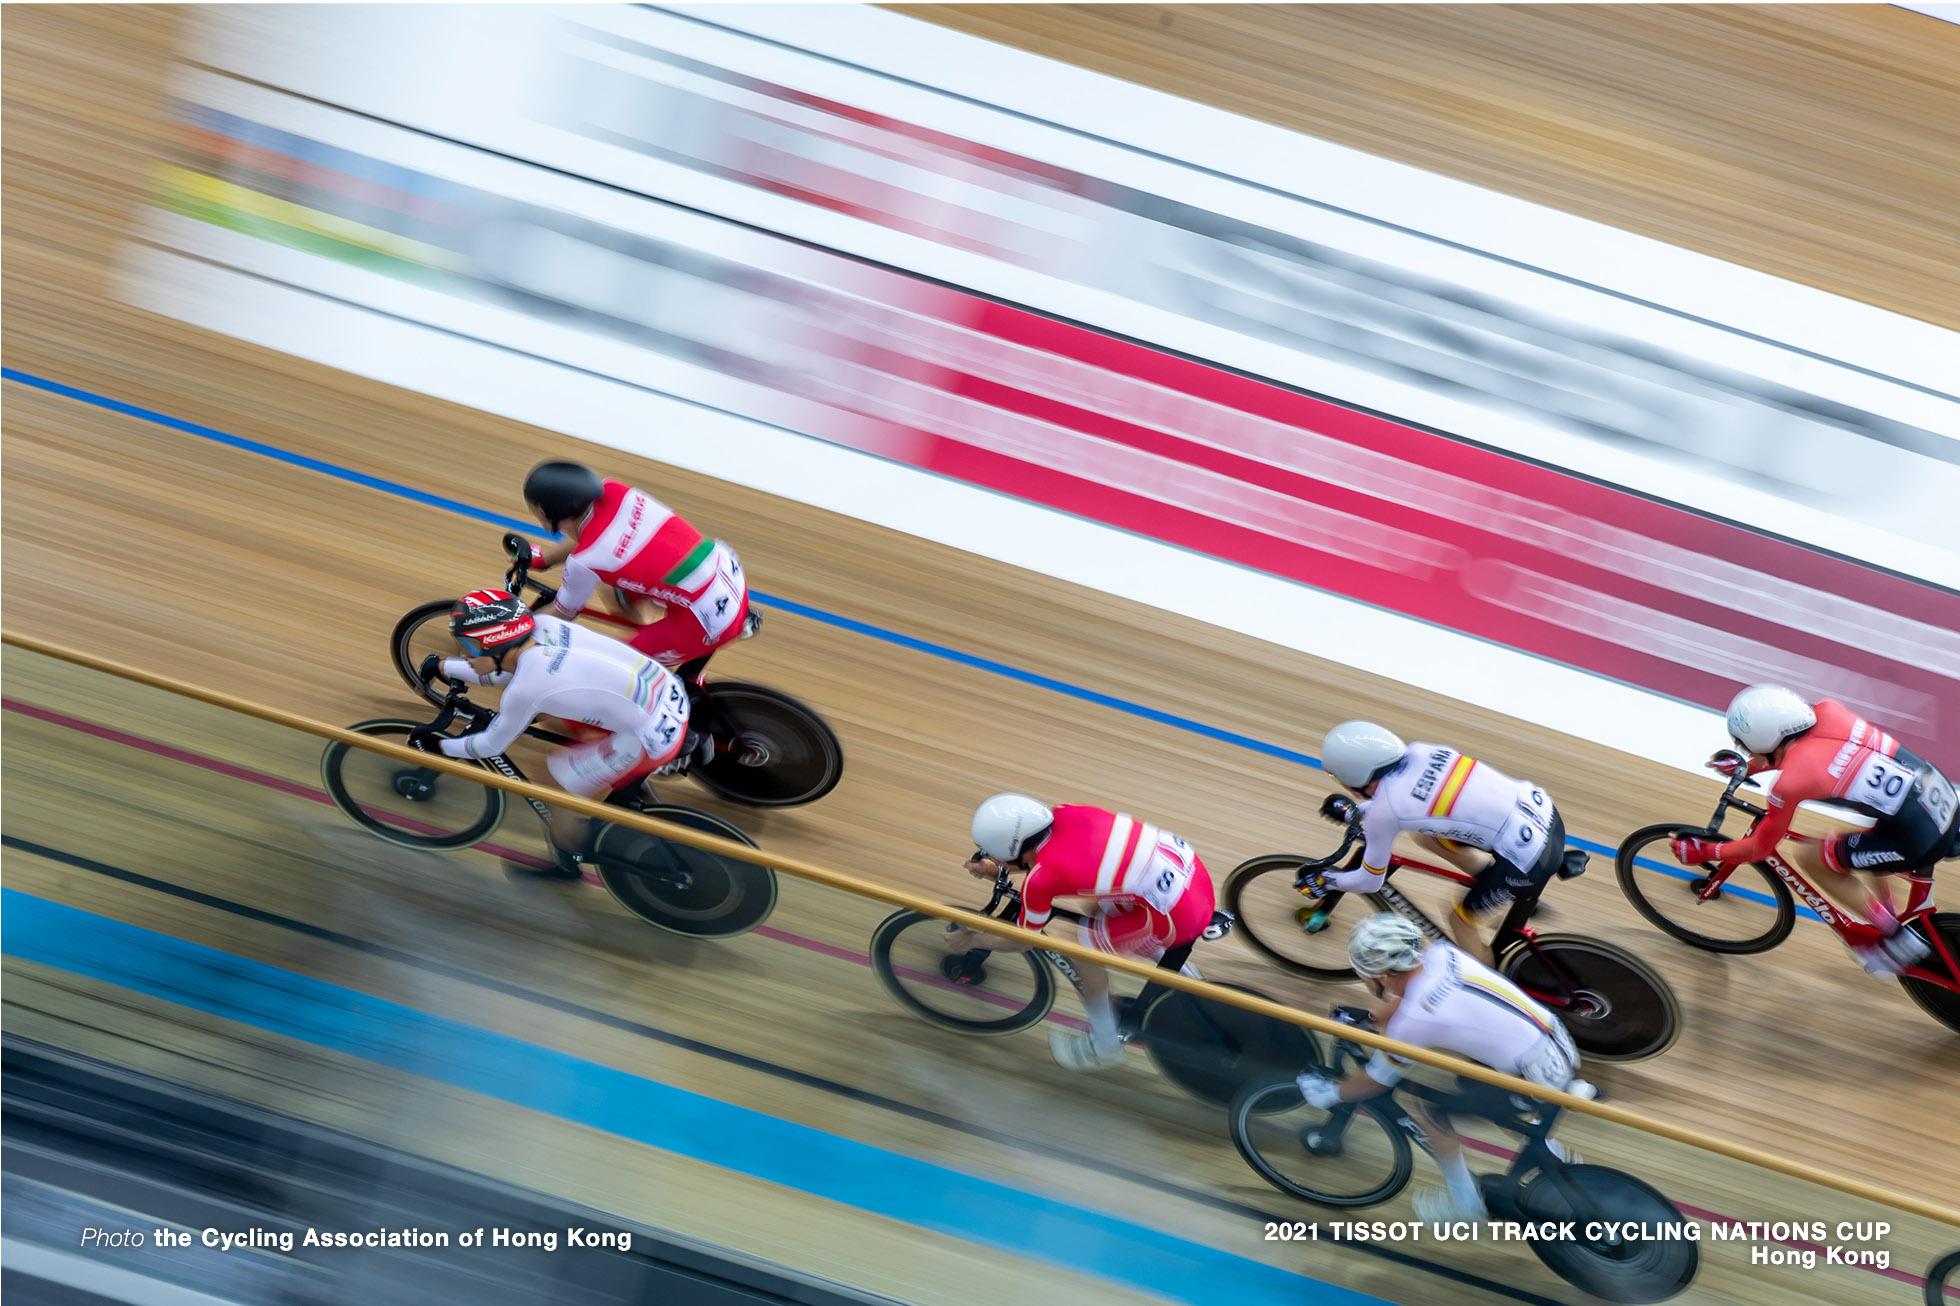 Mens Omnium, TISSOT UCI TRACK CYCLING NATIONS CUP - HONG KONG